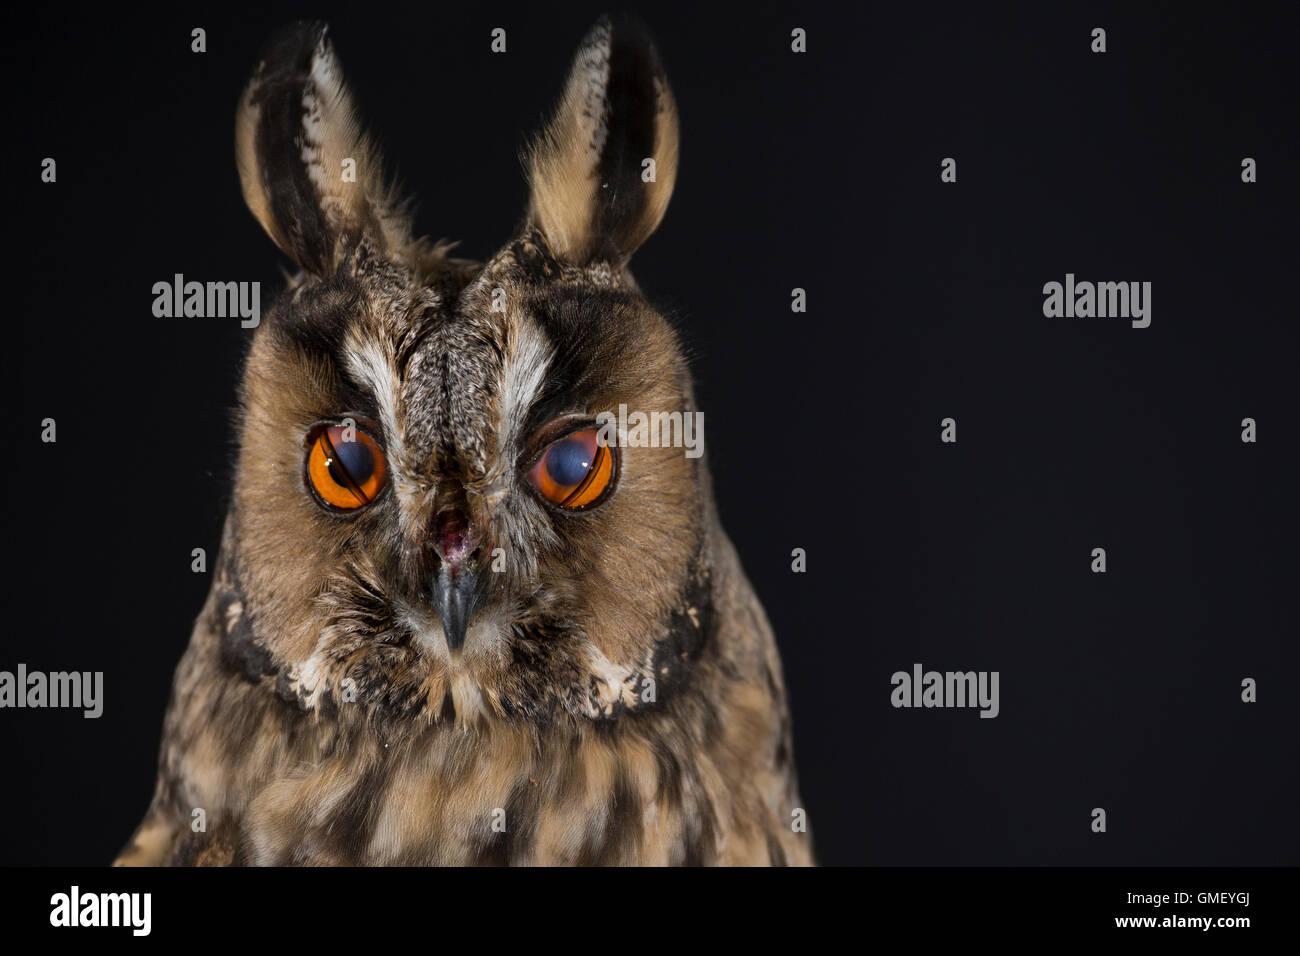 Waldohreule, Nickhaut am Auge, Waldohr-Eule, Asio otus, long-eared owl, Le Hibou moyen-duc - Stock Image